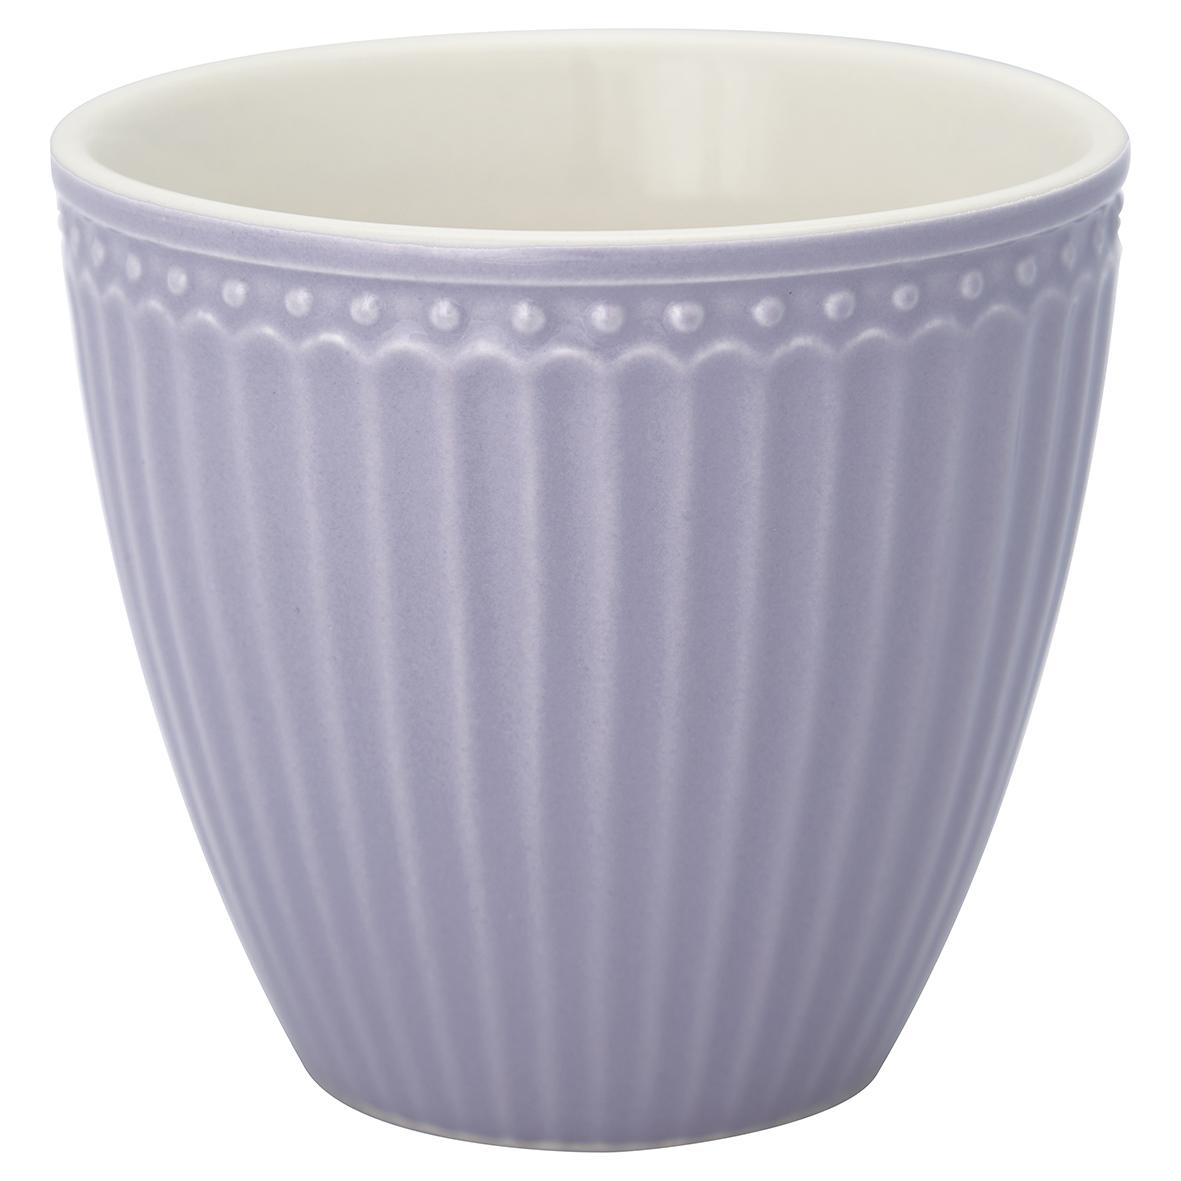 Latte Cup - Alice lavender - Greengate